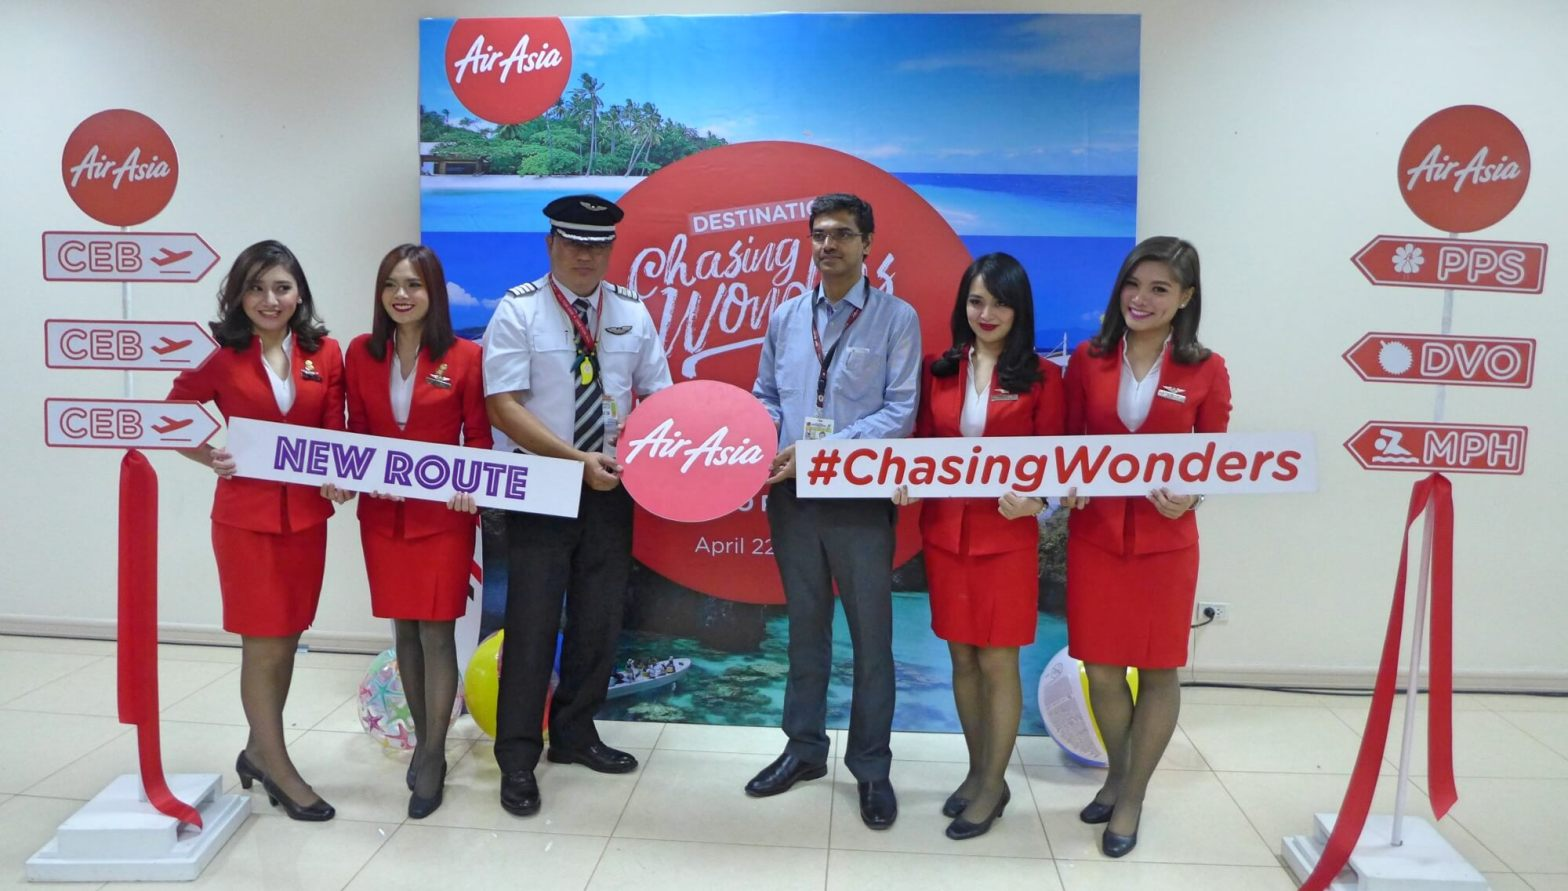 AirAsia new flights Cebu